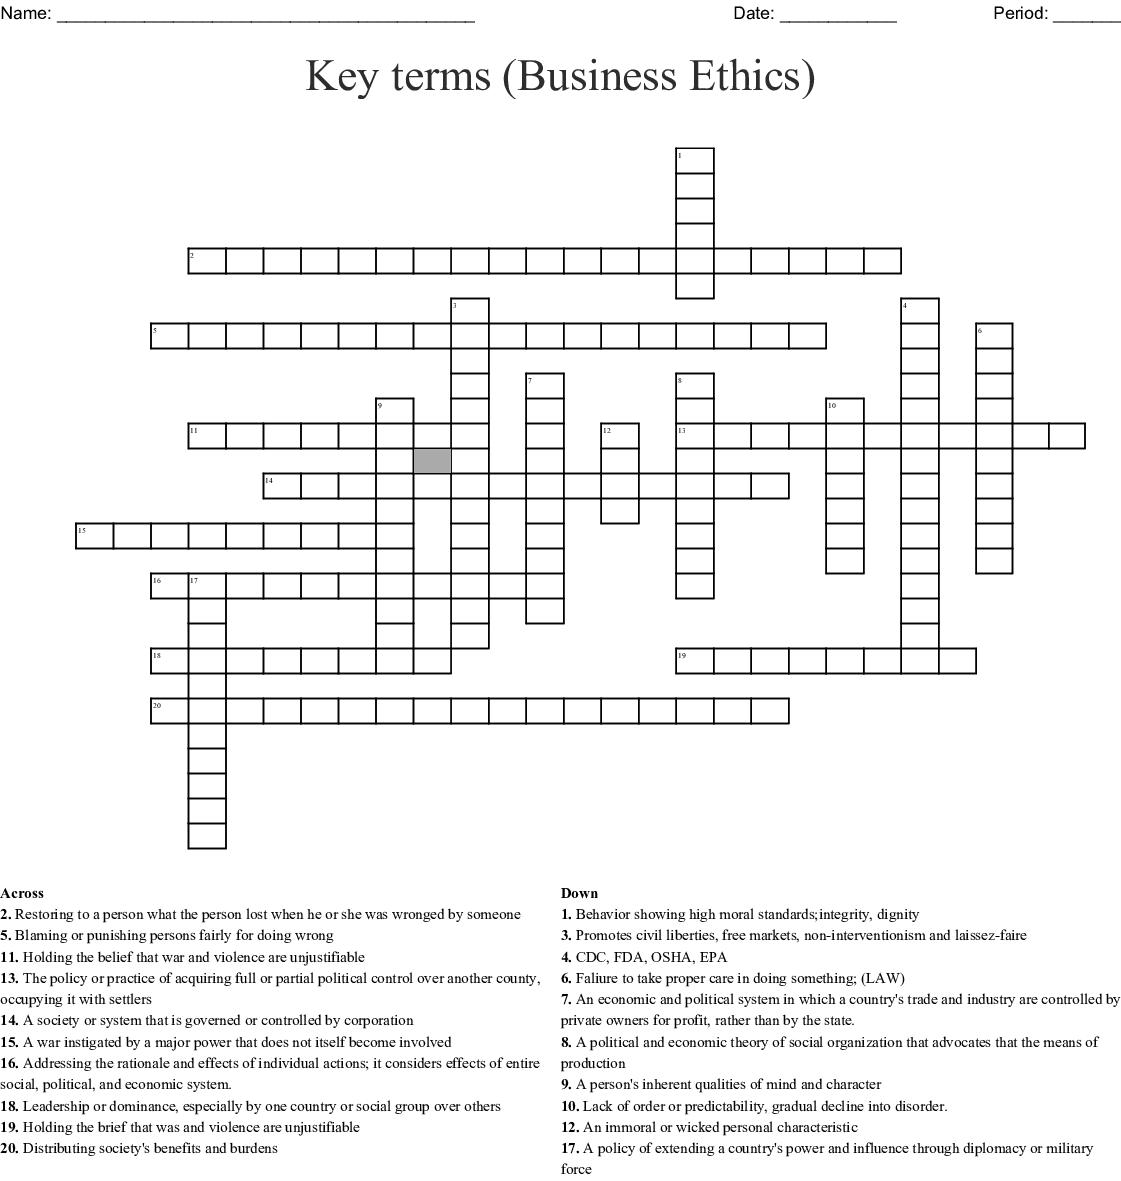 Key Terms Crossword